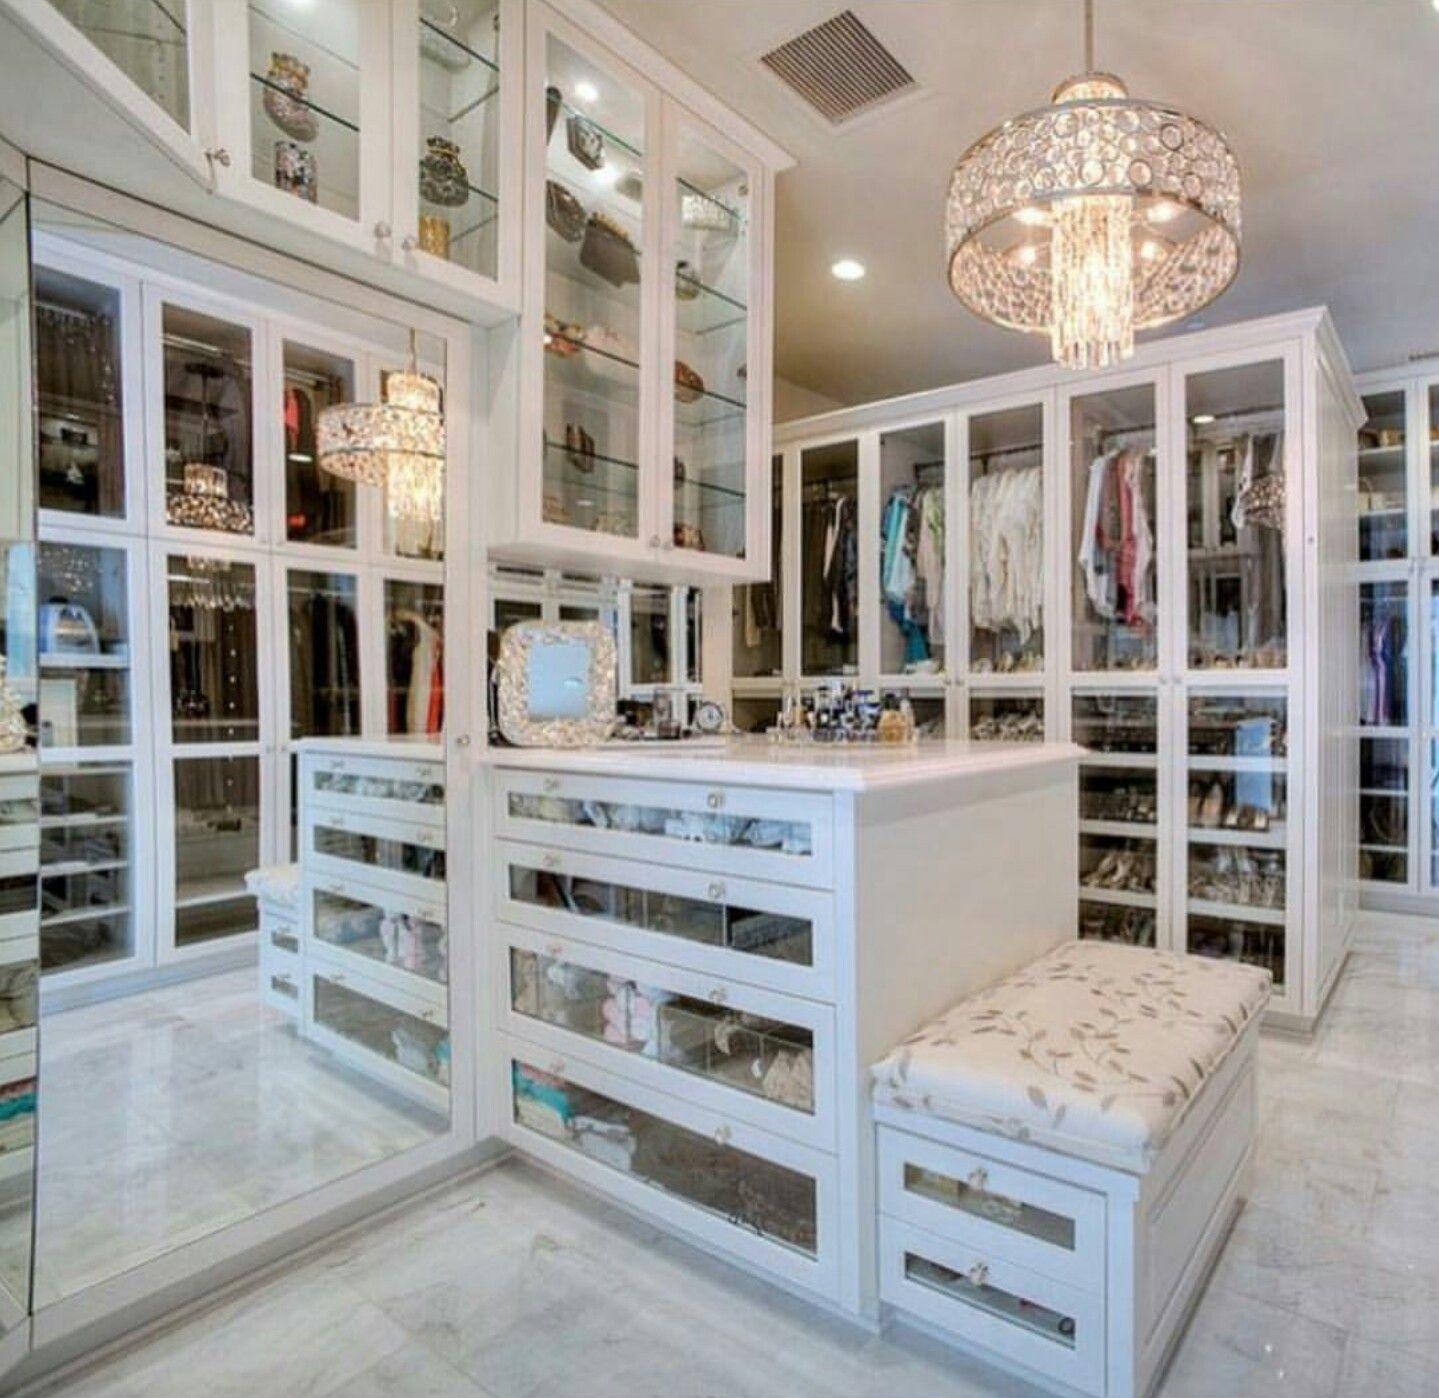 Superbe Like The Glass Shelves